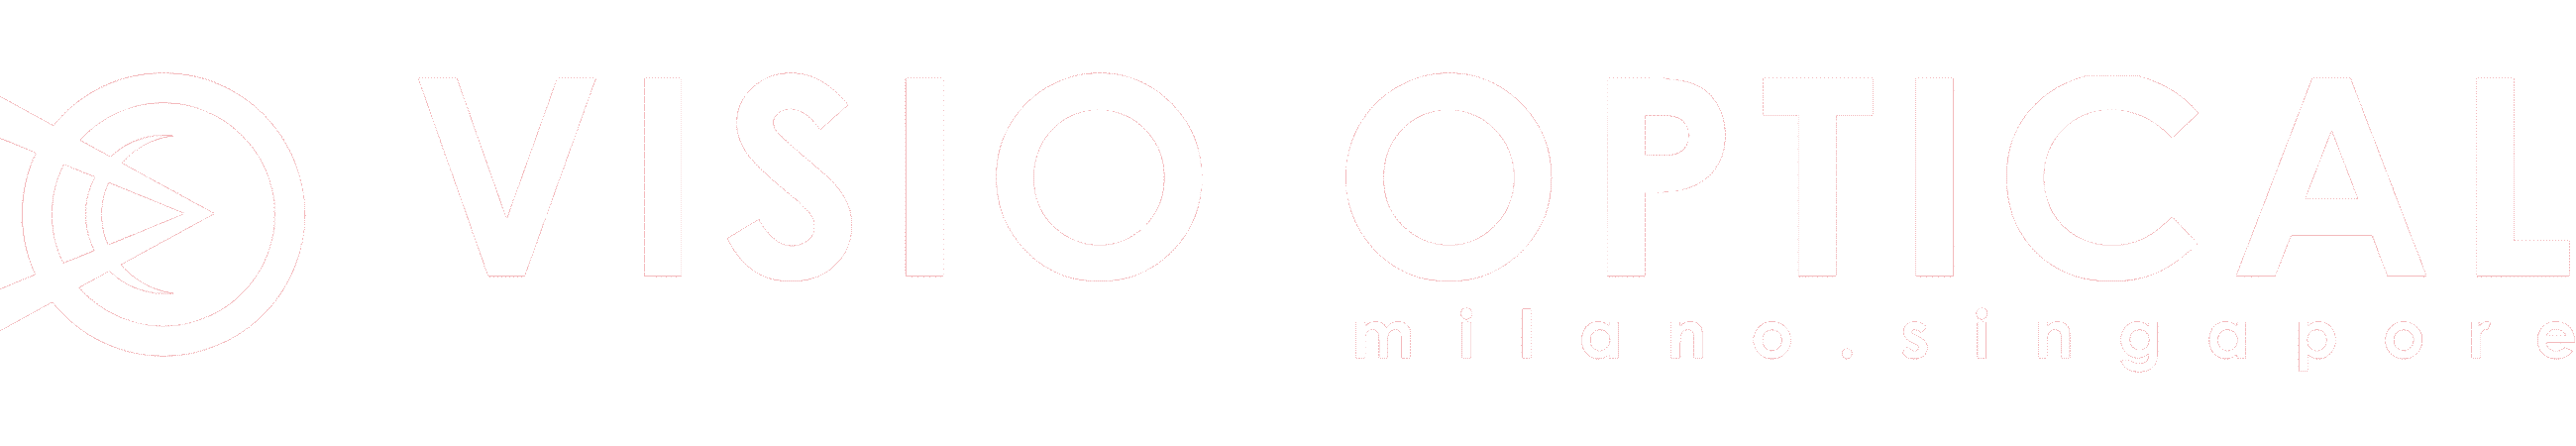 Visio Optical